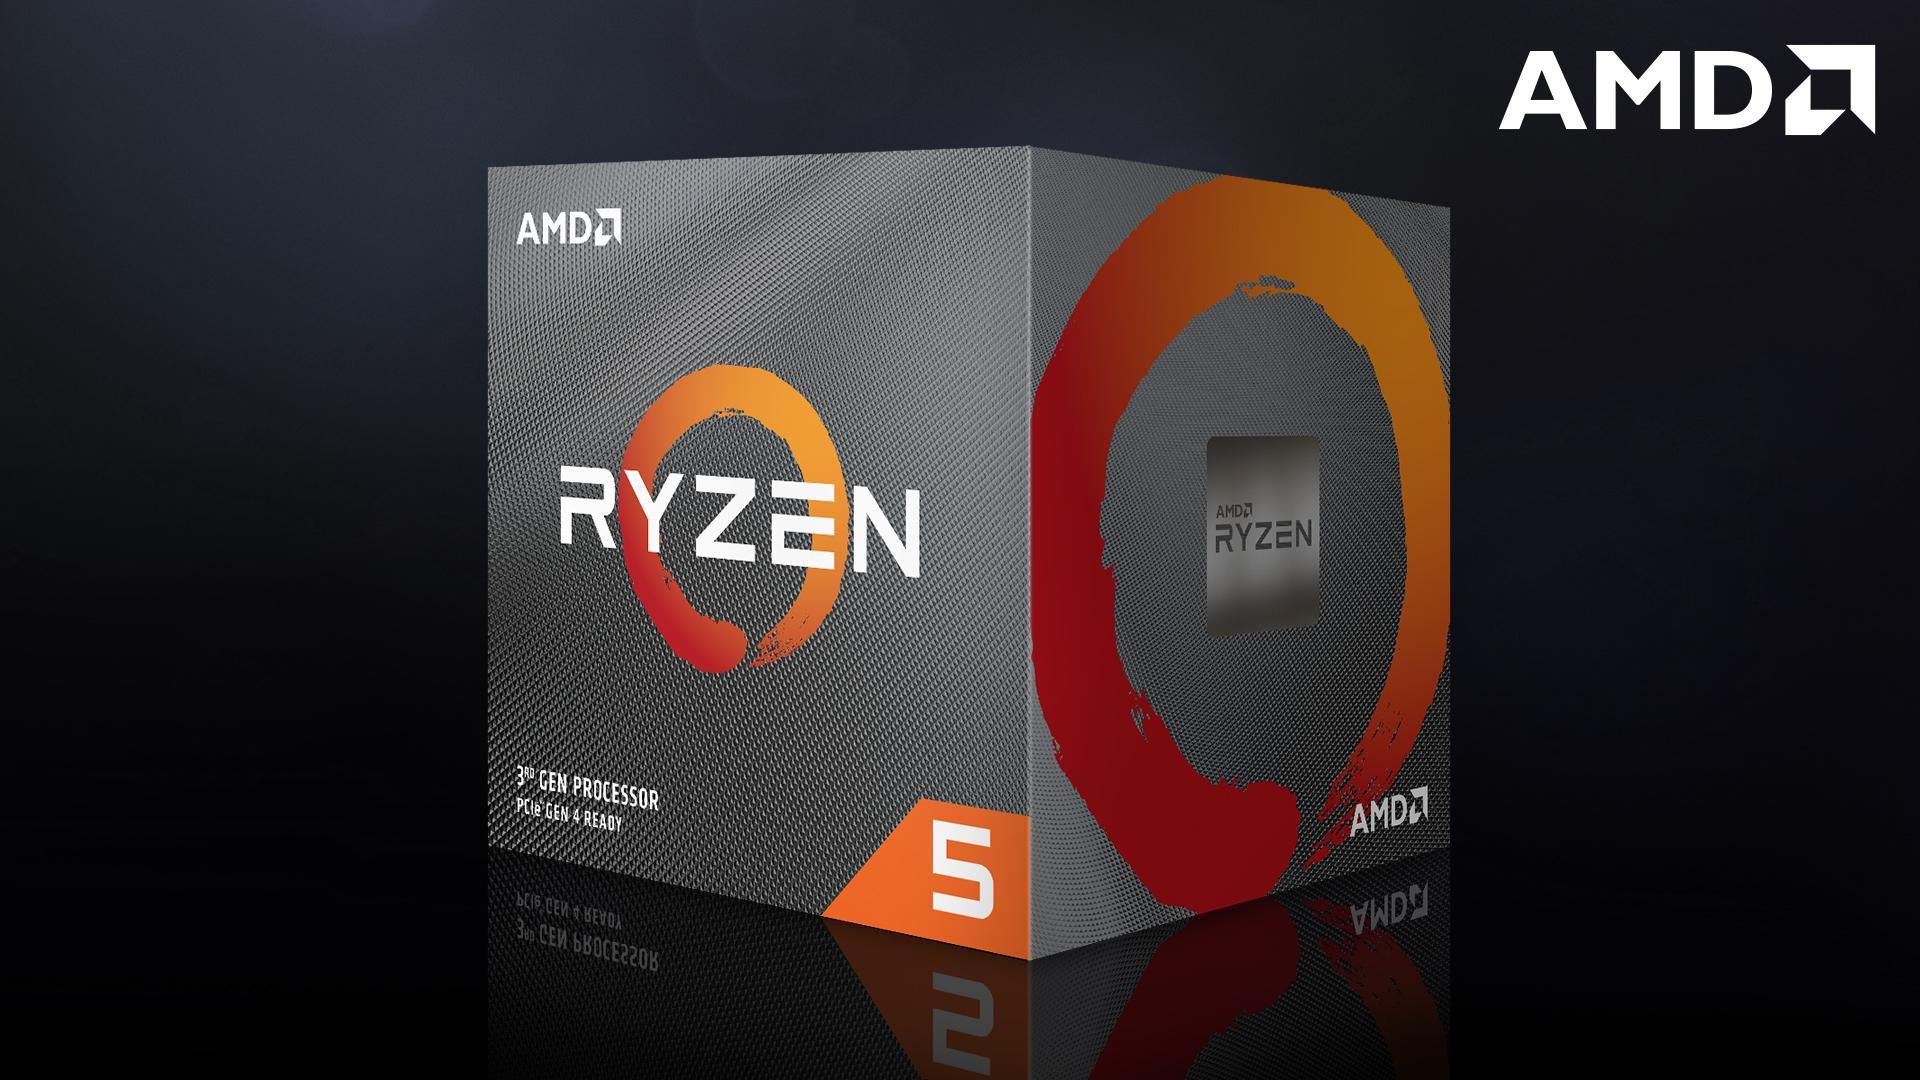 Amd Ryzen 5 3600 6 Core 12 Thread Cpu On Sale For 174 99 Us